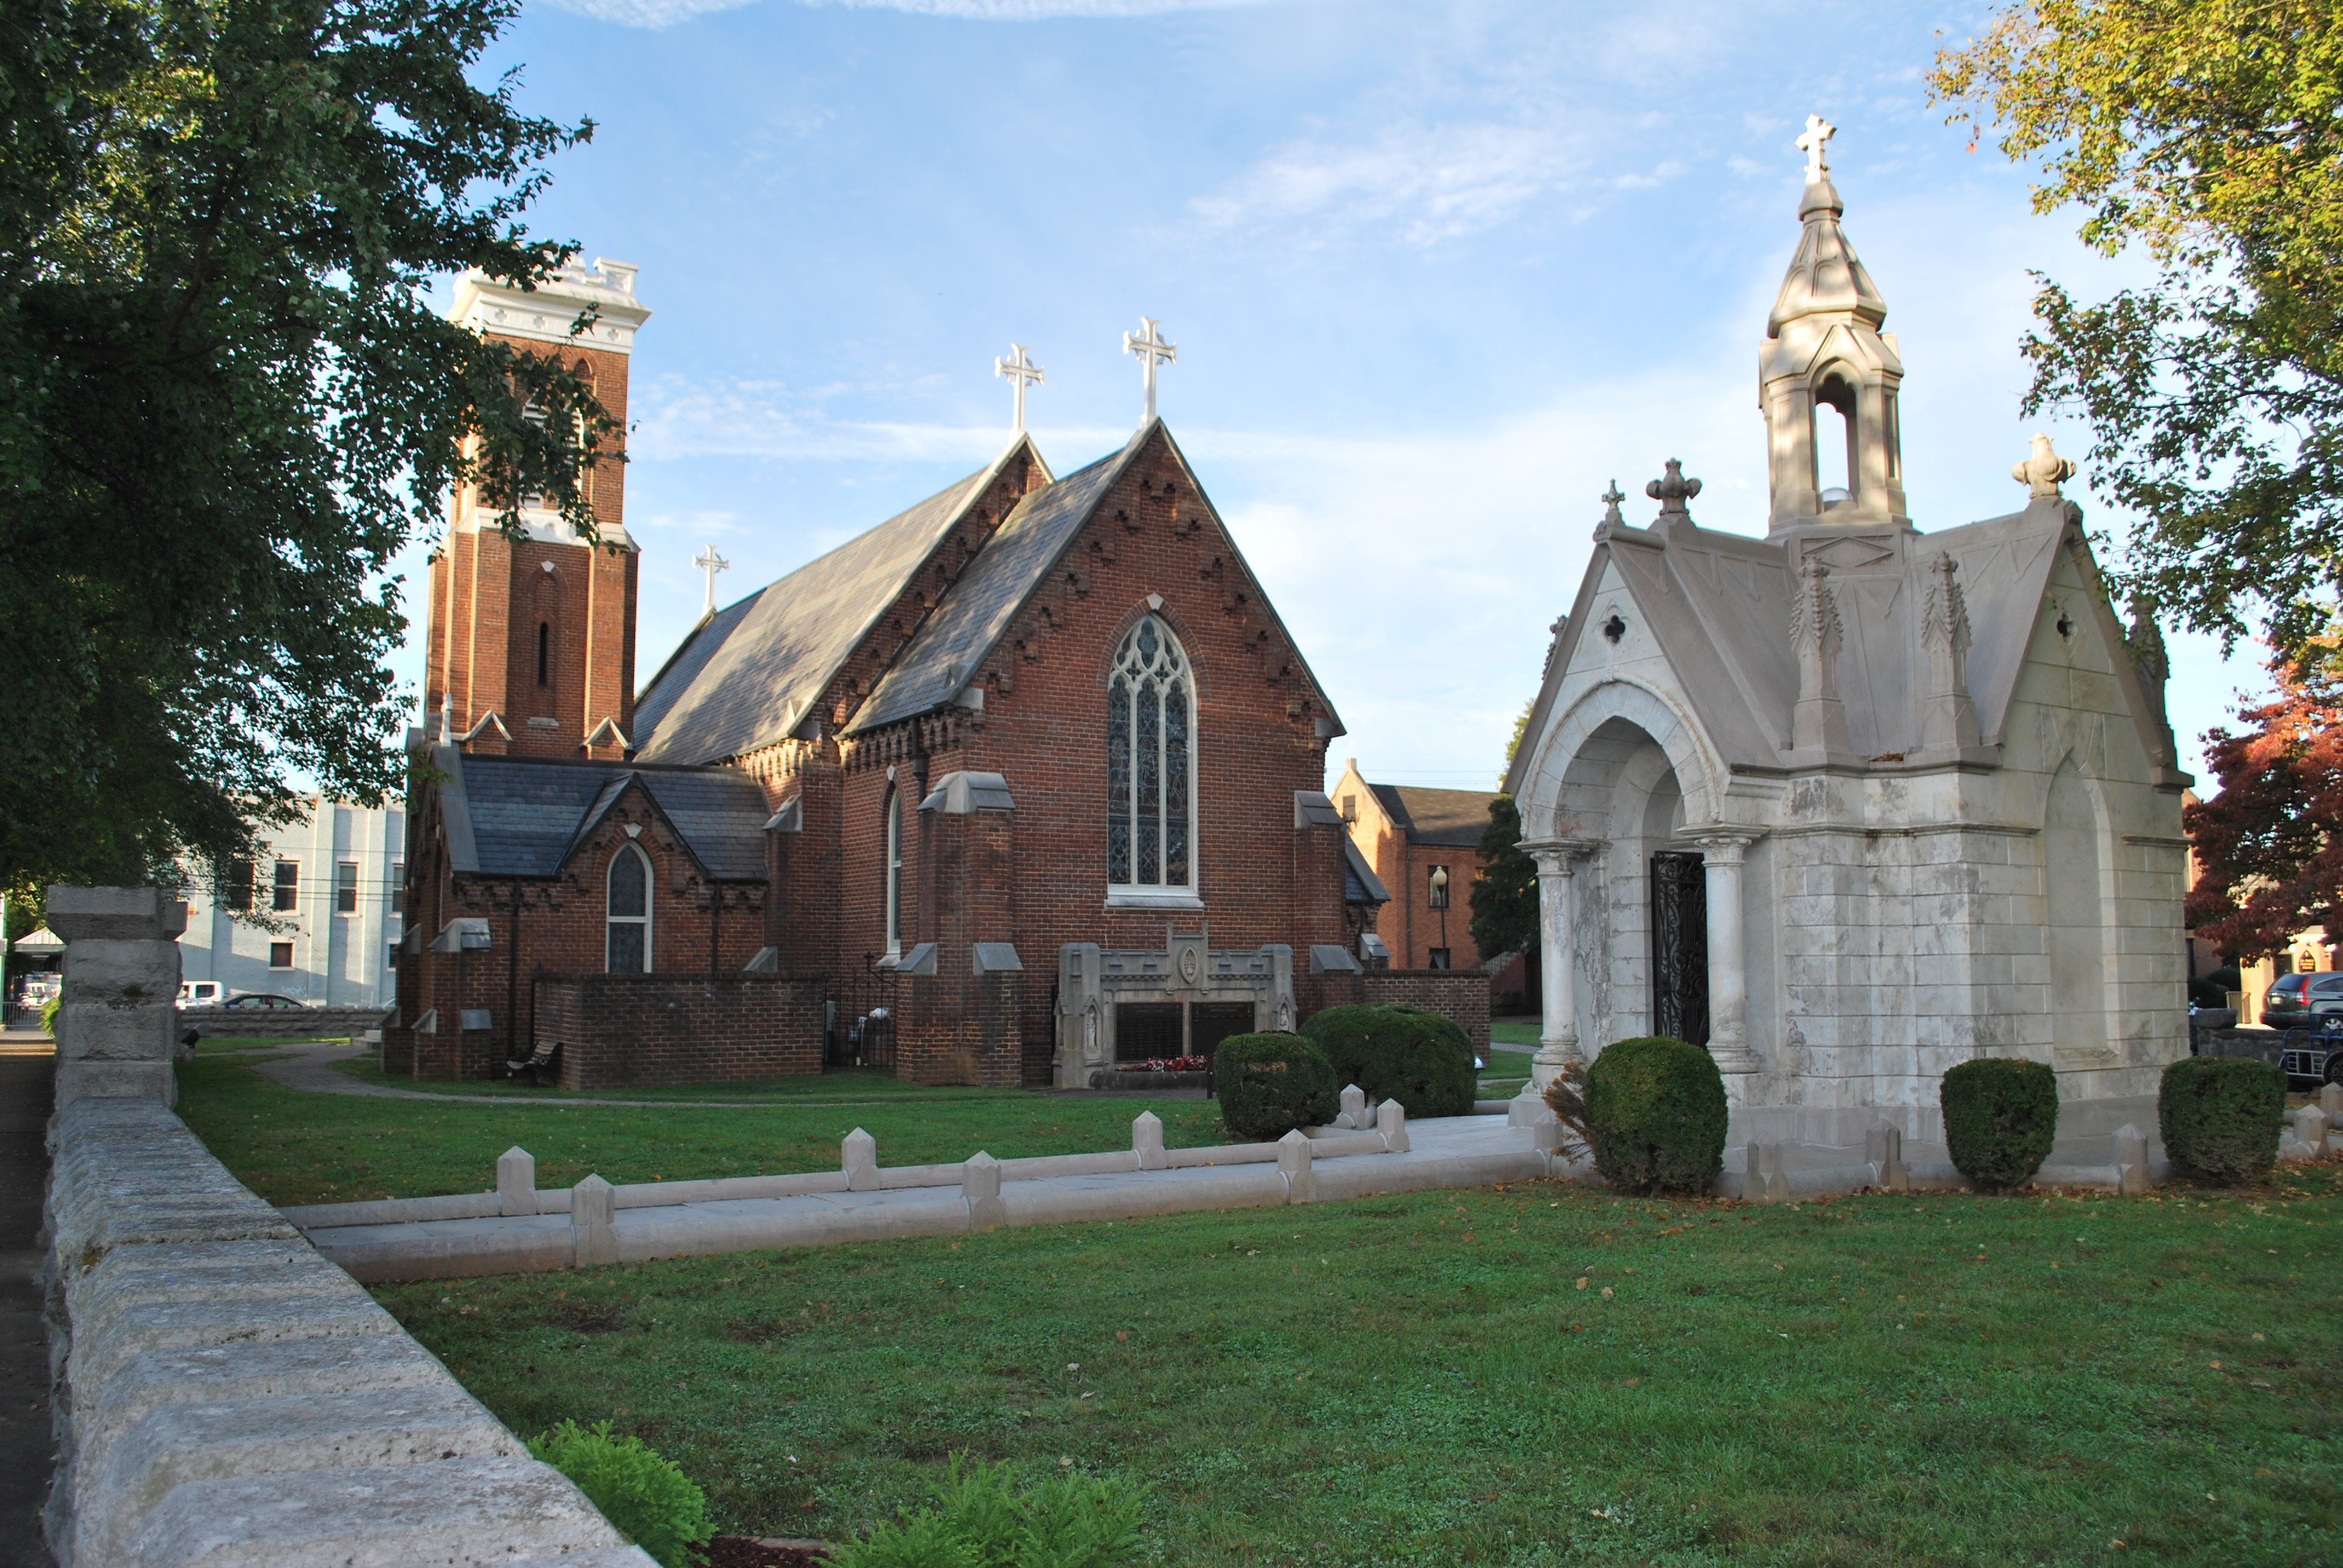 Church and Mausoleum